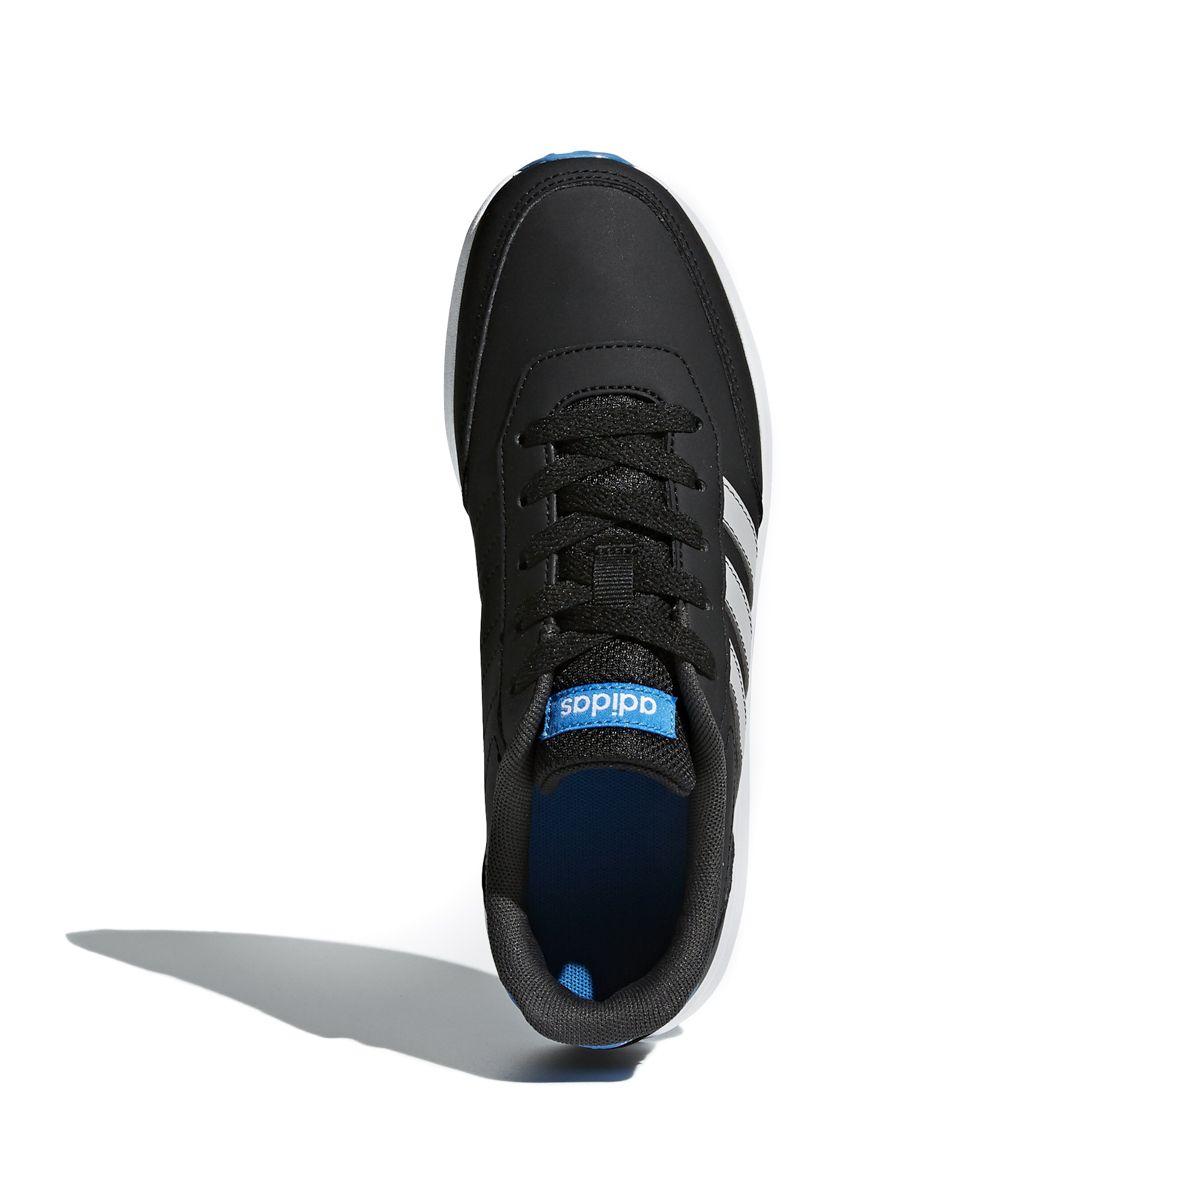 258d472c62 Adidas fiú cipő VS SWITCH 2 K | Markasbolt.hu Hivatalos ADIDAS ...